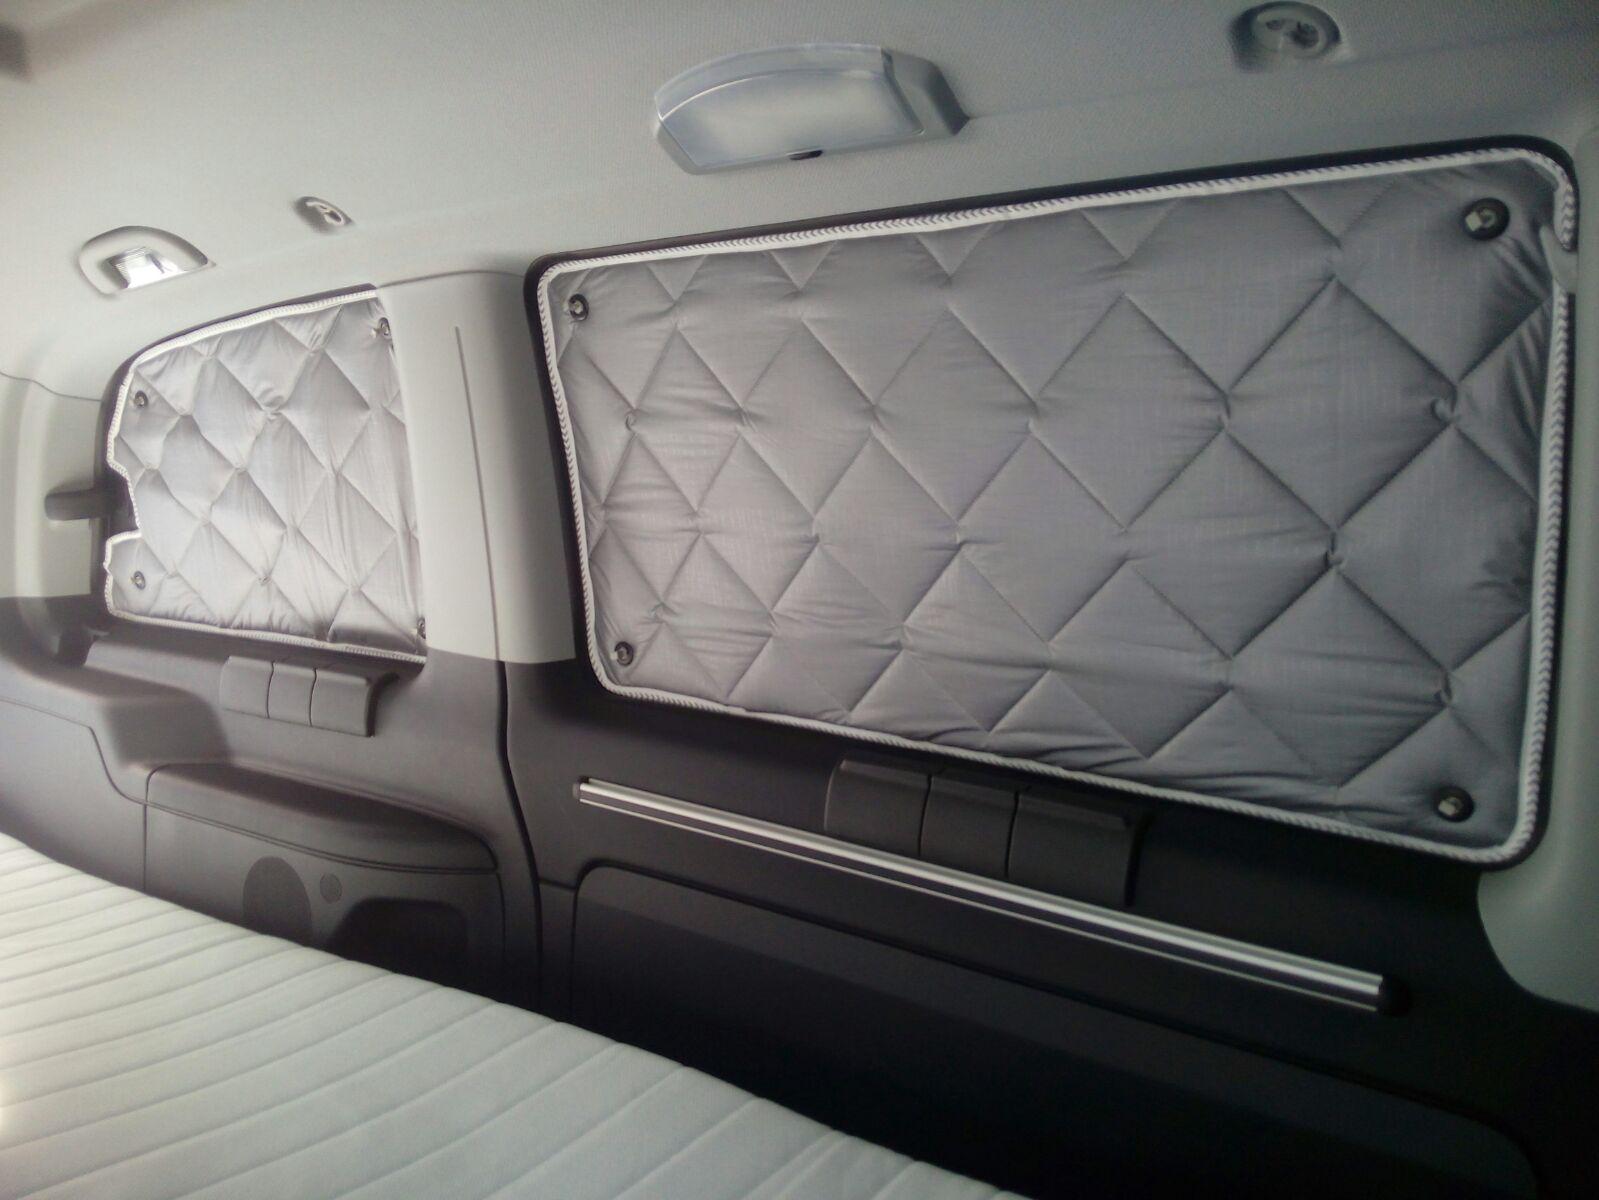 Aislante para furgonetas materiales de construcci n para - Mejores aislantes termicos ...